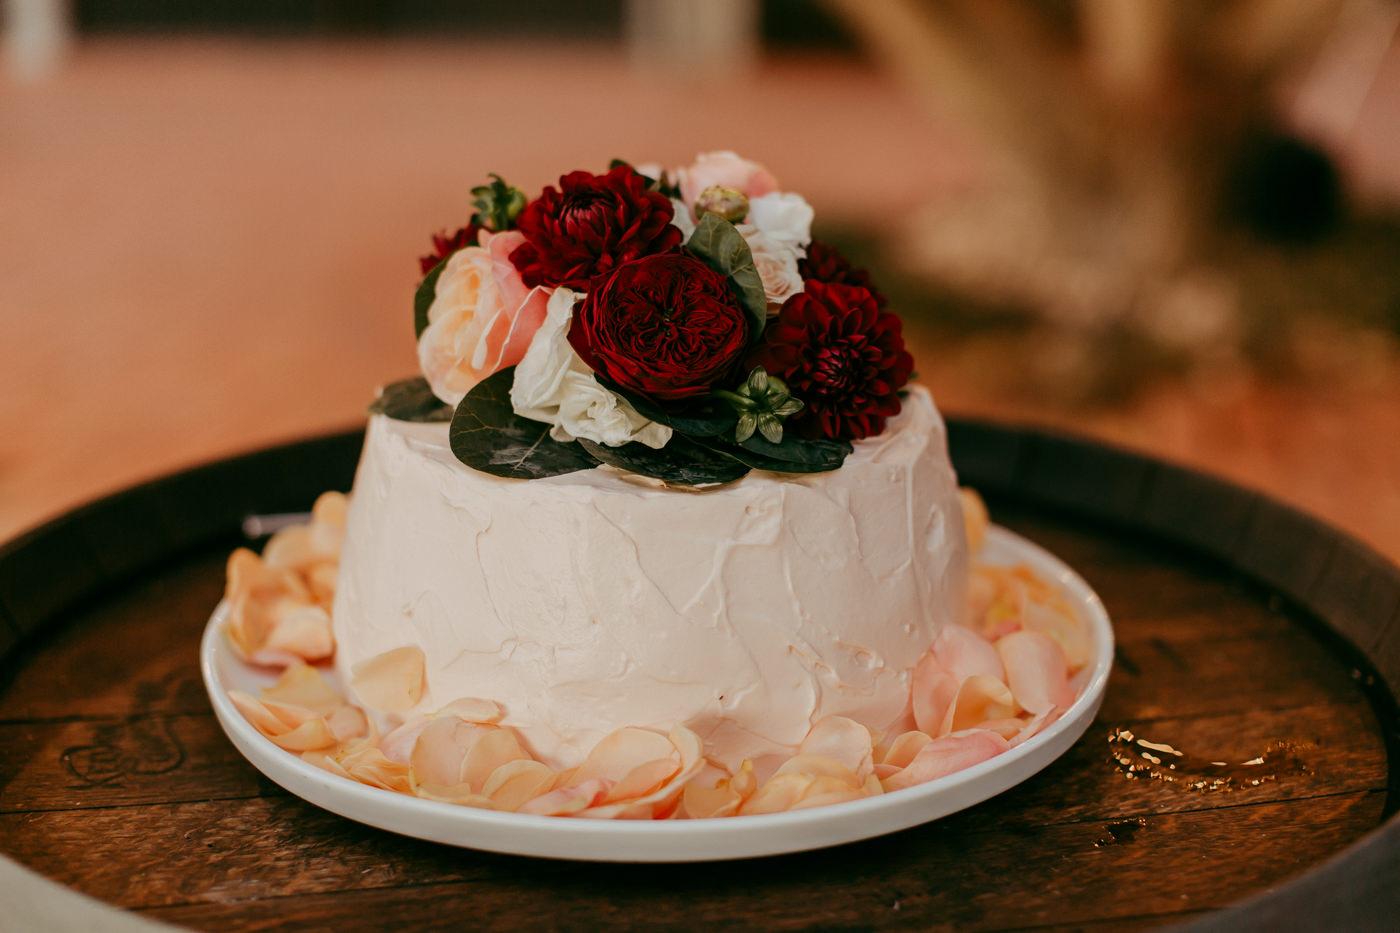 Anthony & Eliet - Wagga Wagga Wedding - Country NSW - Samantha Heather Photography-167.jpg